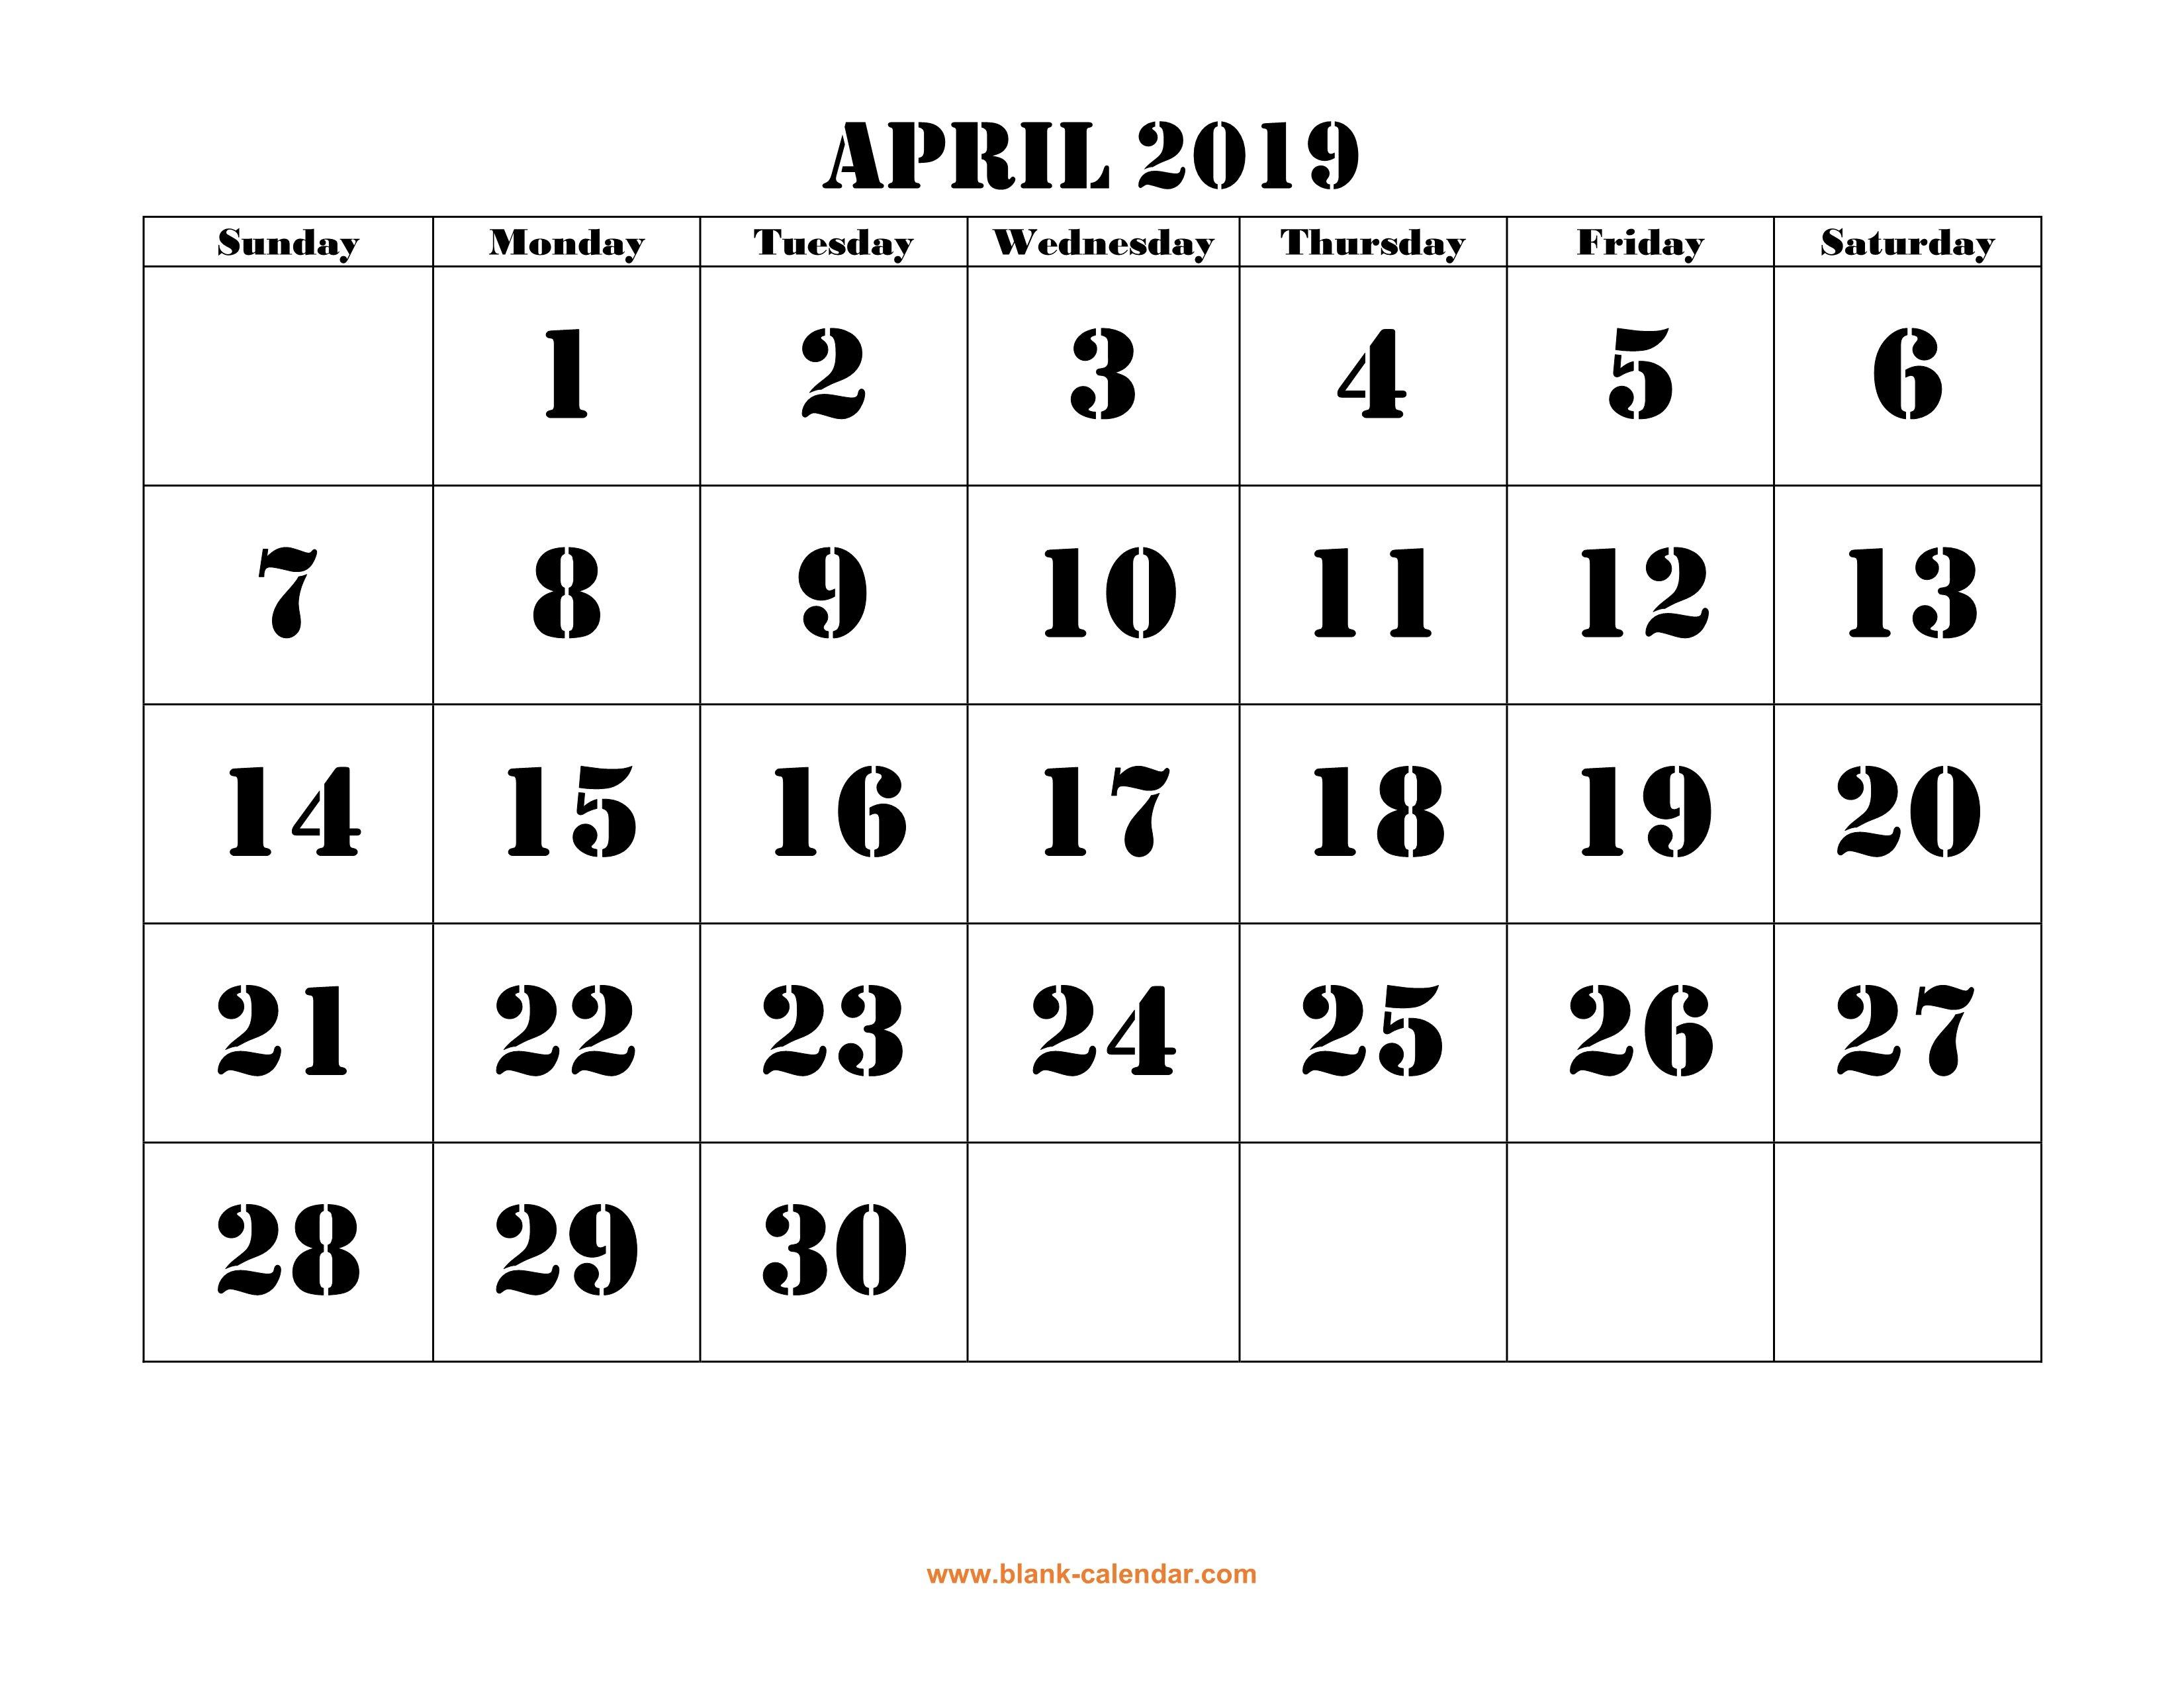 Free Download Printable April 2019 Calendar, Large Font Design April 8 2019 Calendar